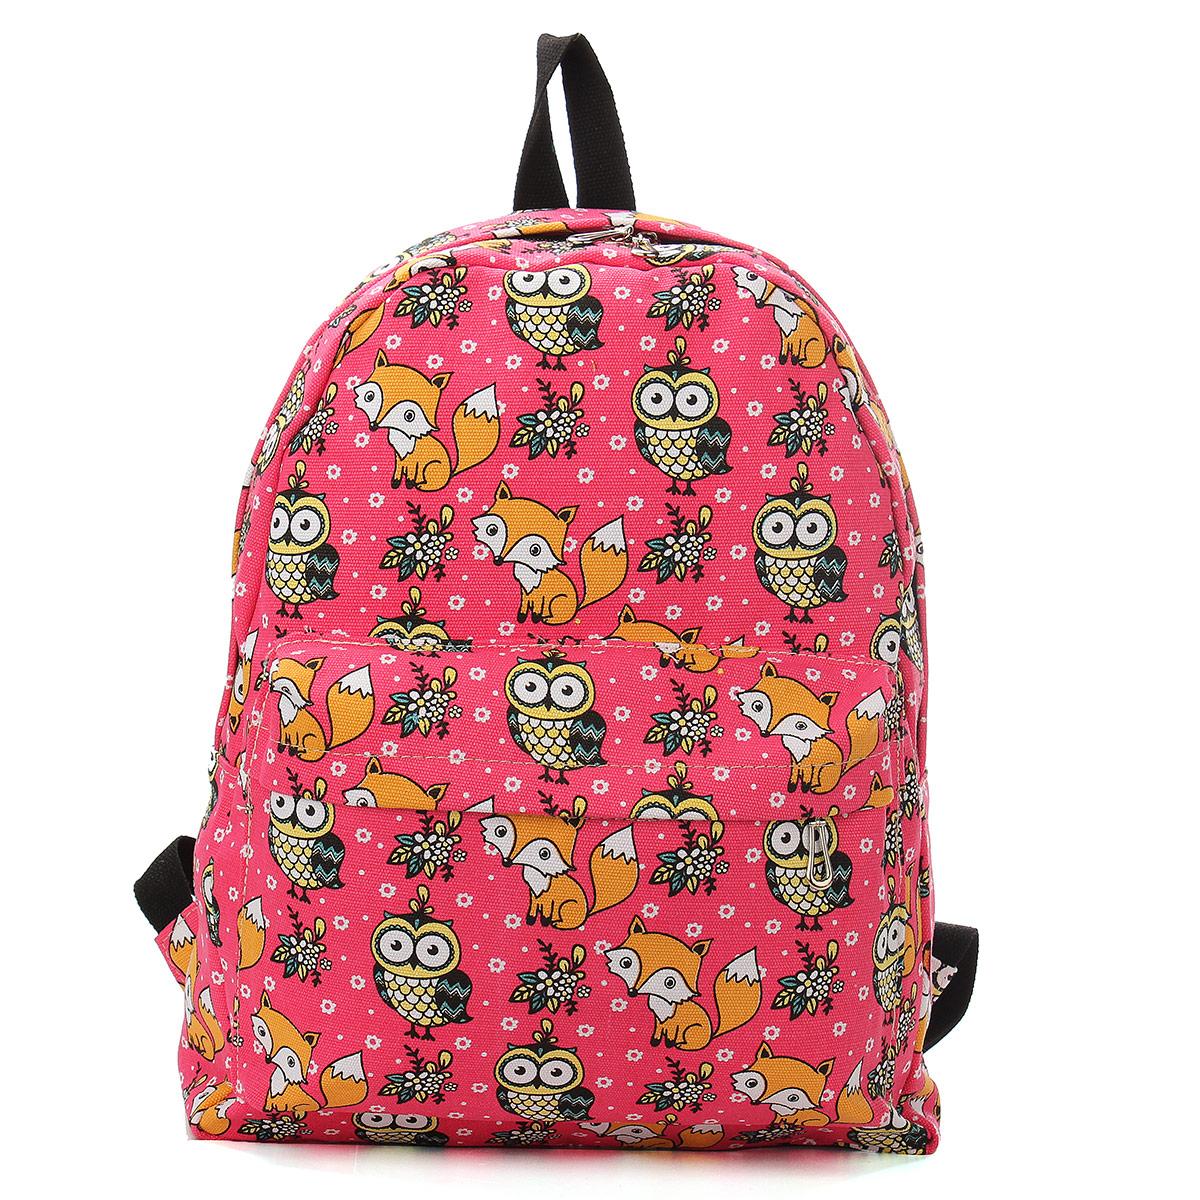 Owl Backpack For Girls - Crazy Backpacks